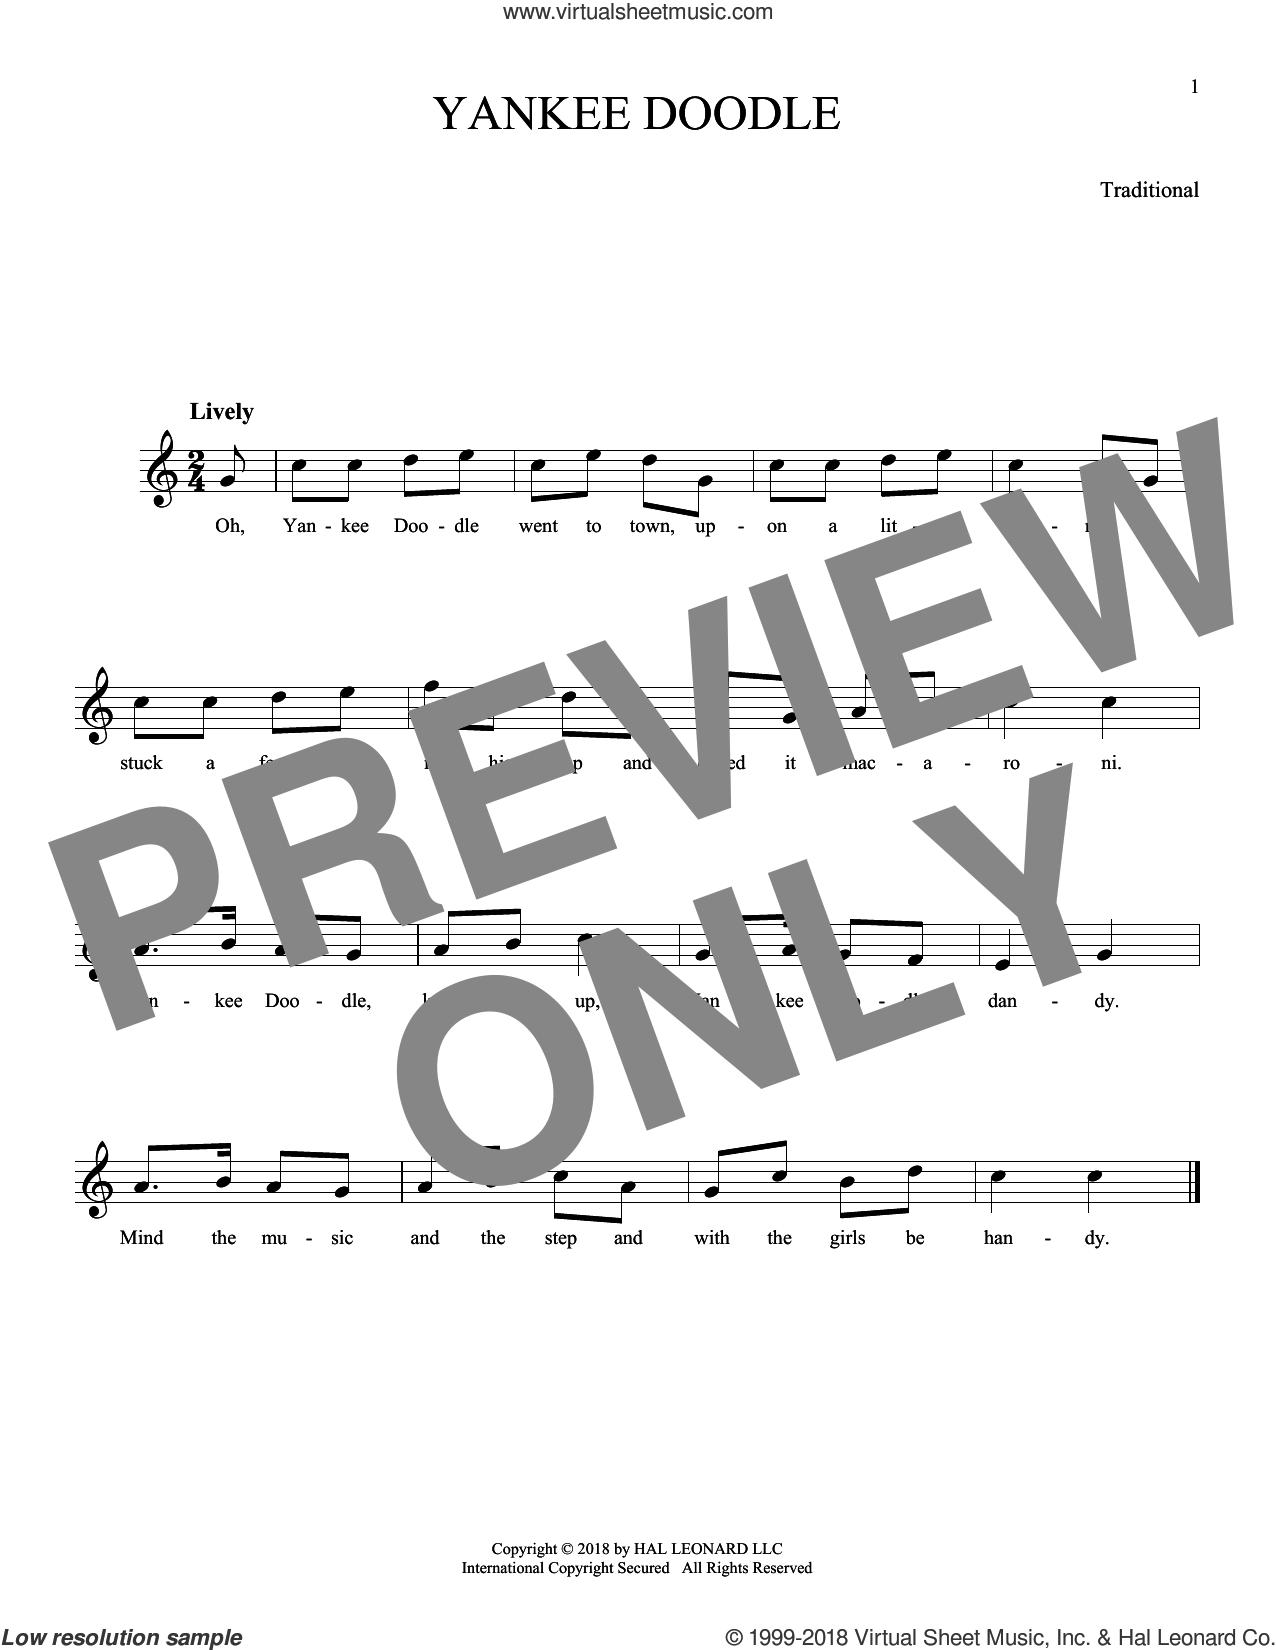 Yankee Doodle sheet music for ocarina solo, intermediate skill level